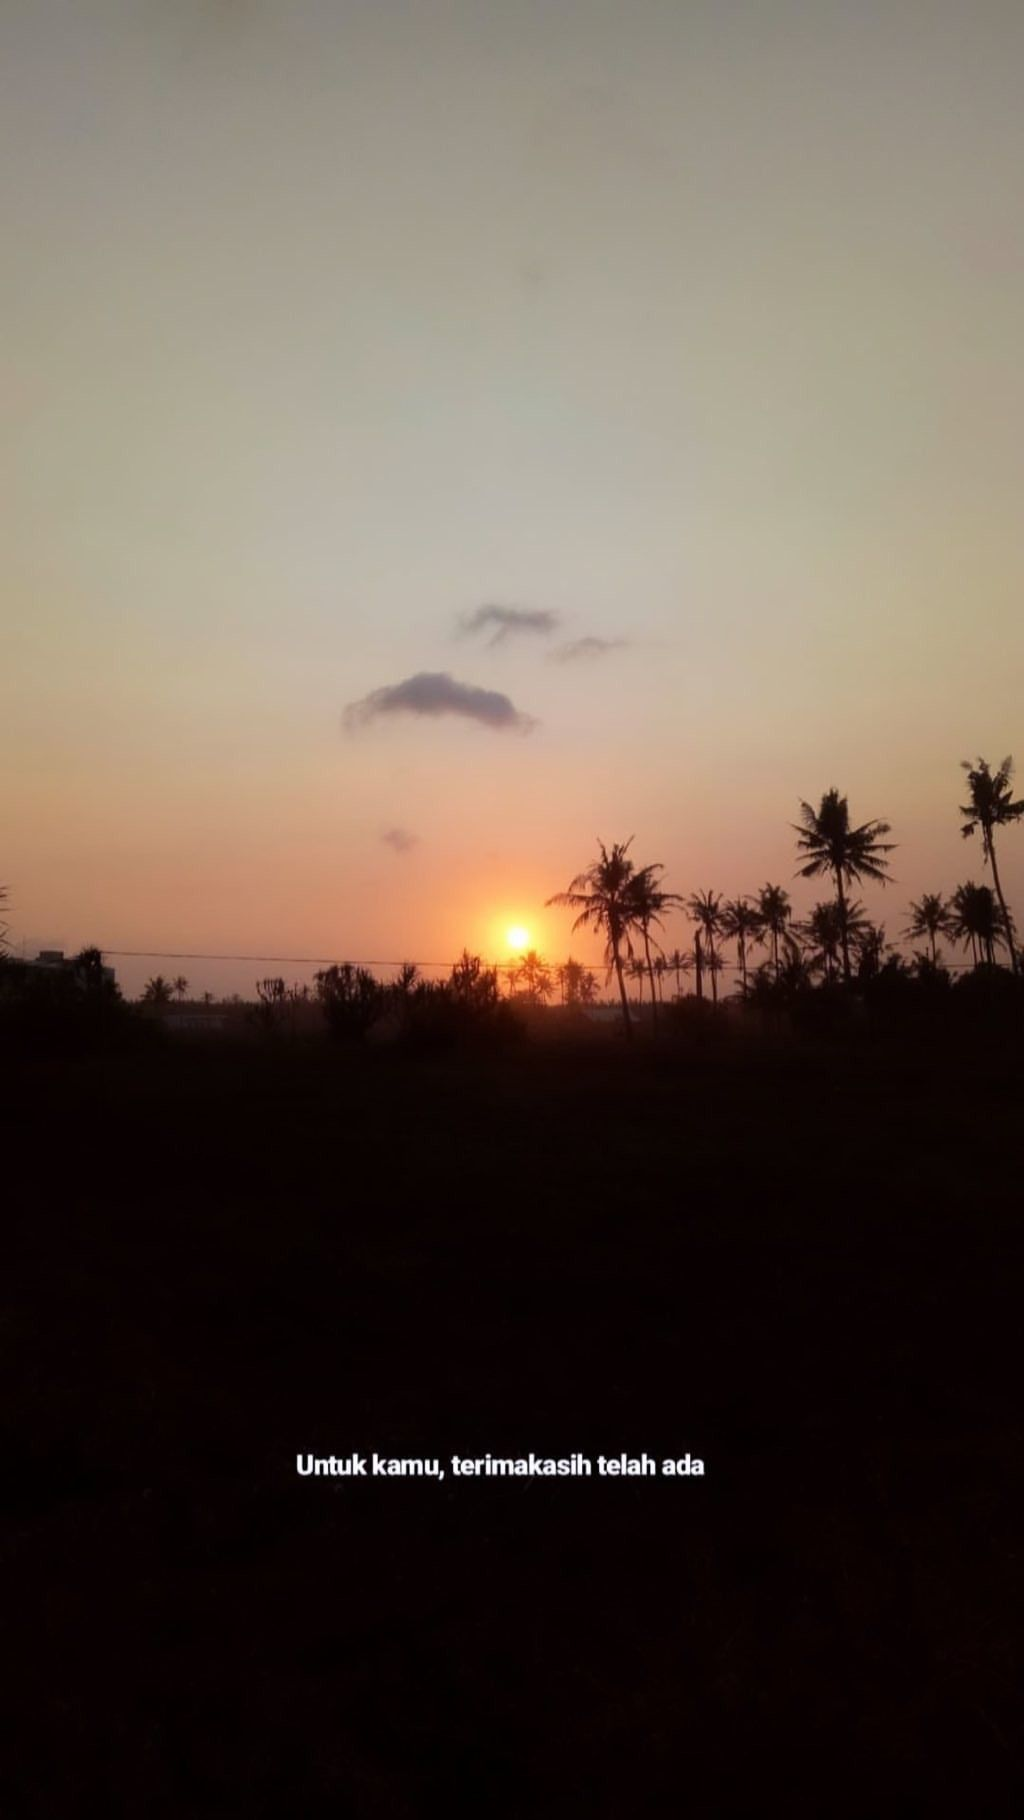 Pin Oleh Arindra W K Di Kutipan Kutipan Hidup Kata Kata Indah